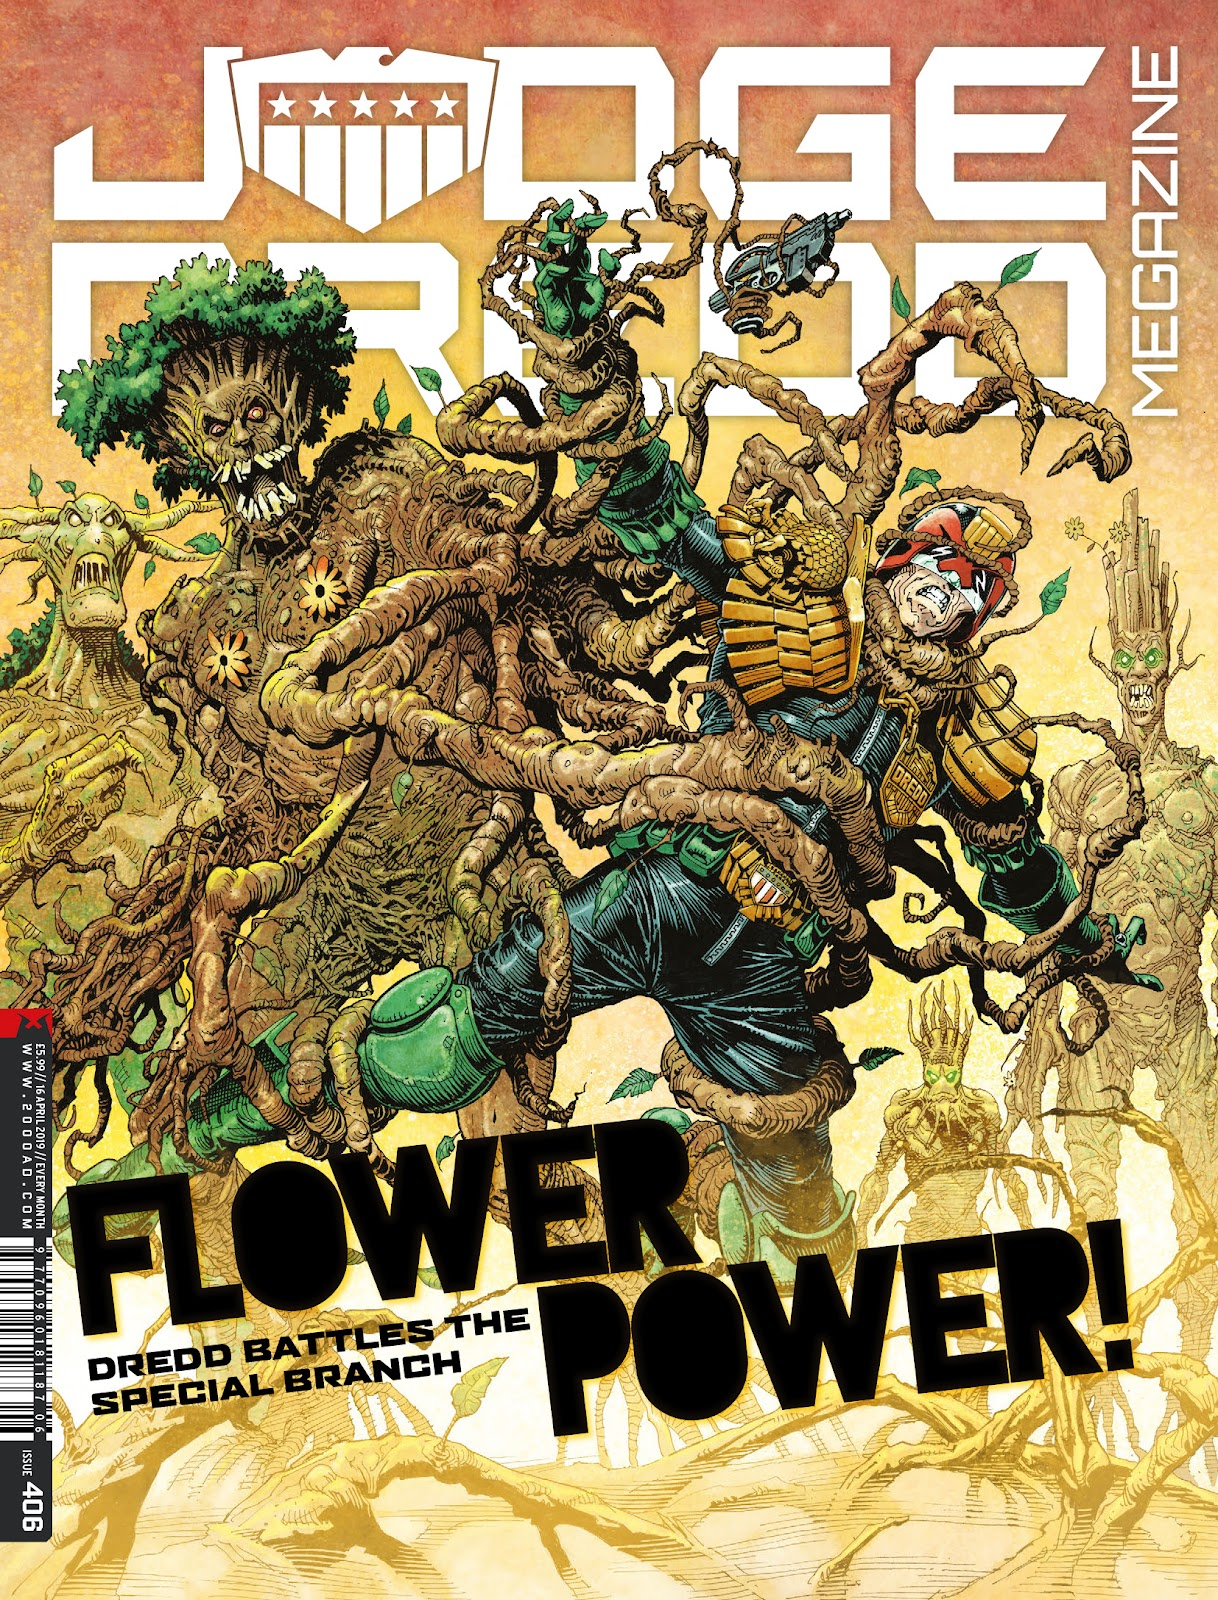 Judge Dredd Megazine (Vol.5) issue 406 - Page 1